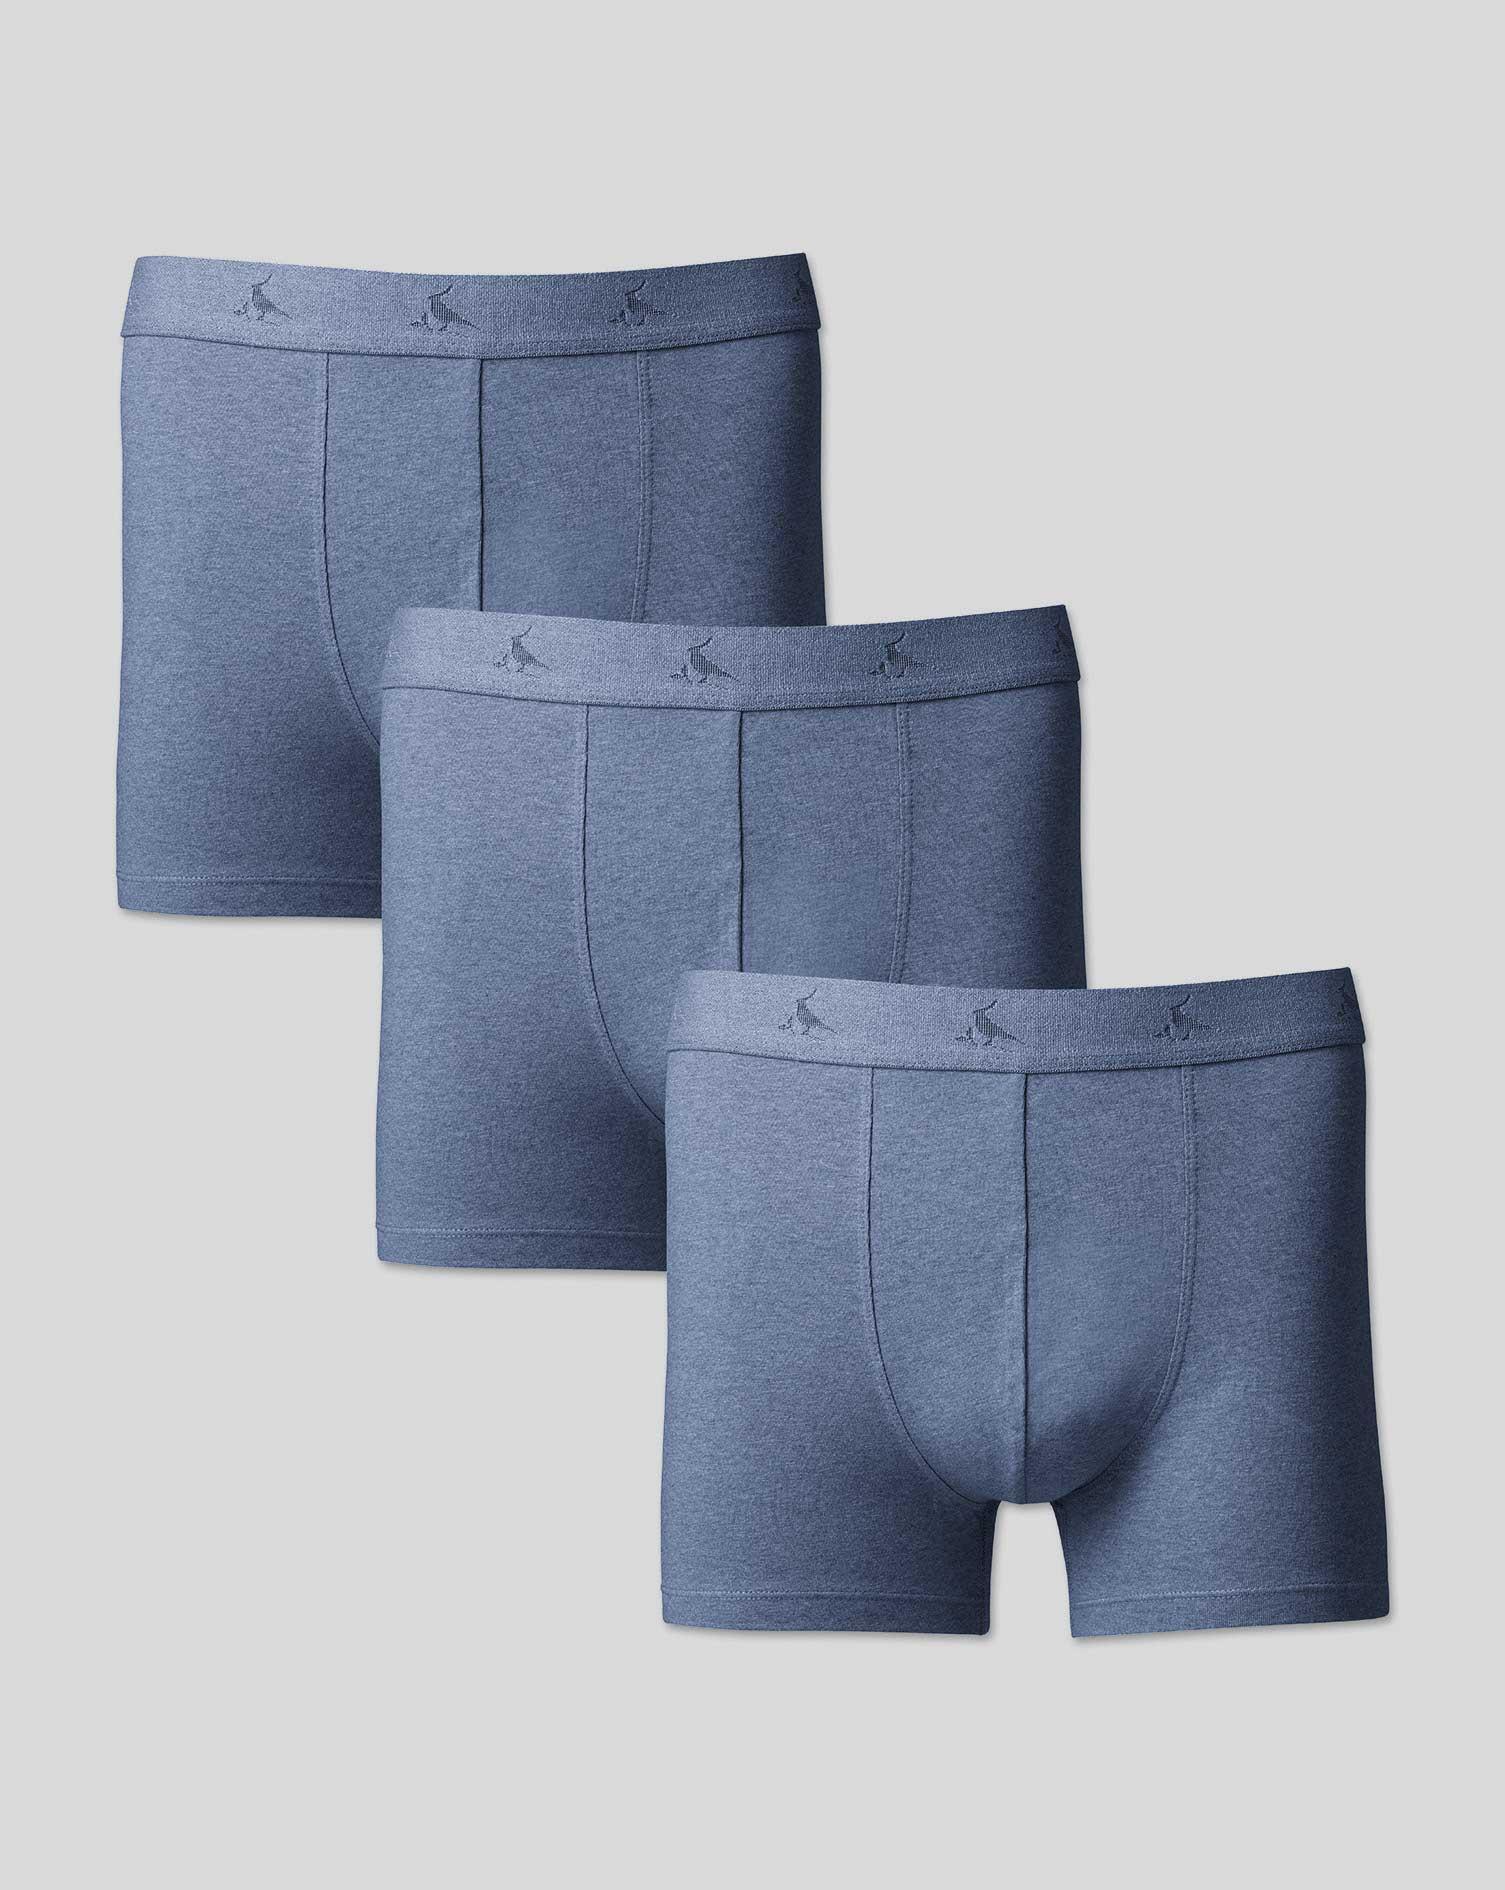 Image of Charles Tyrwhitt 3 Pack Cotton Stretch Jersey Trunks - Blue Size Medium by Charles Tyrwhitt